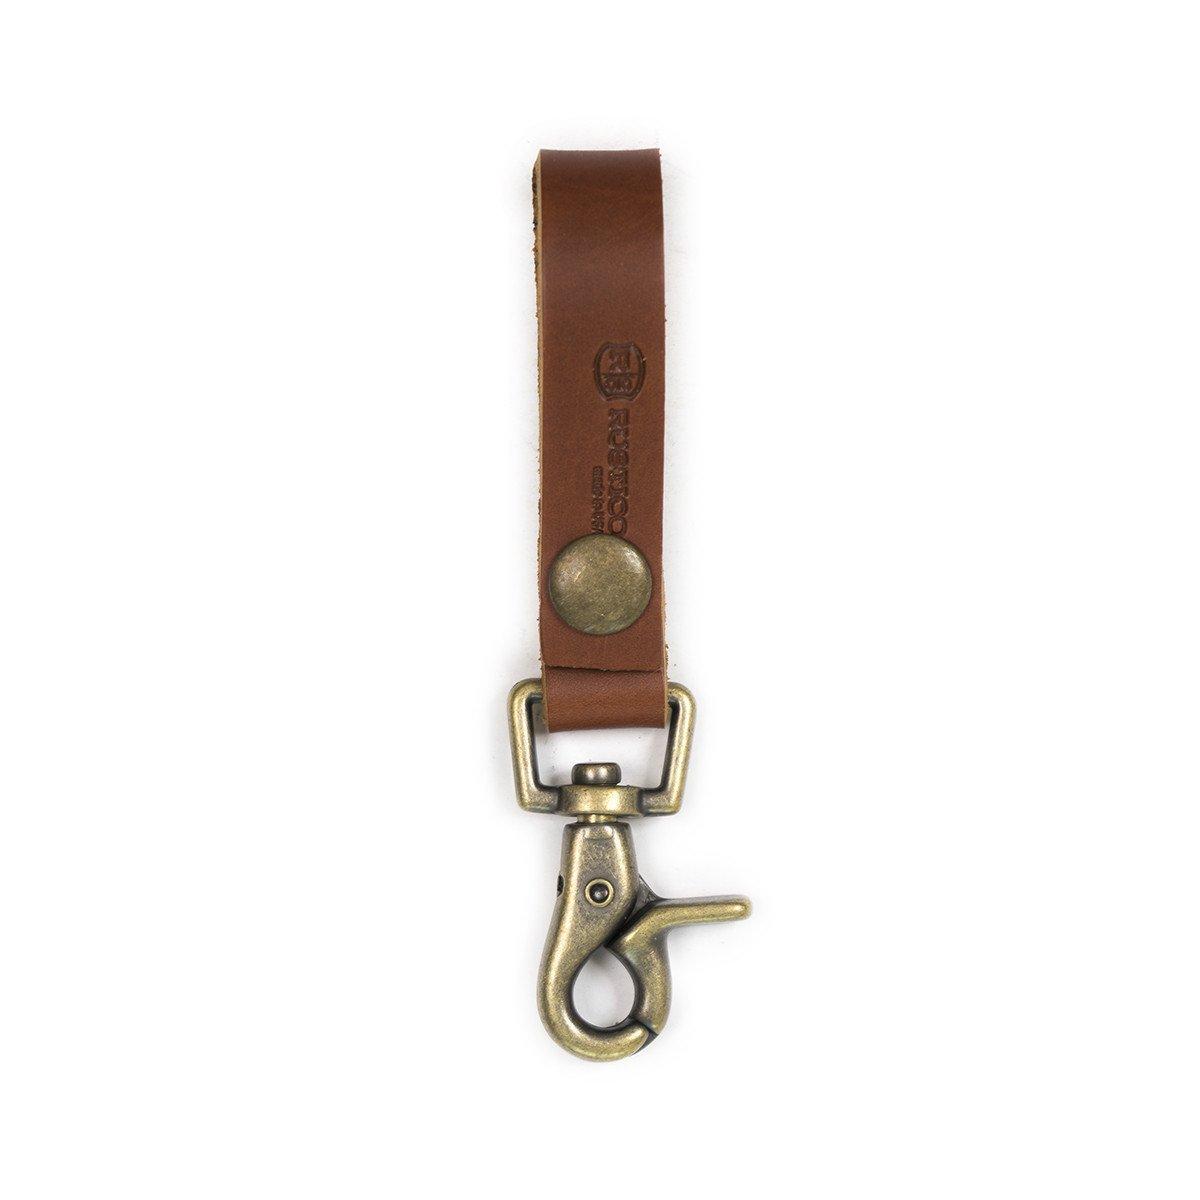 super-loop-leather-keychain-saddle-leather-top-view_1_b98ff513-5d5b-46d3-a0fd-5674b4e2c46f